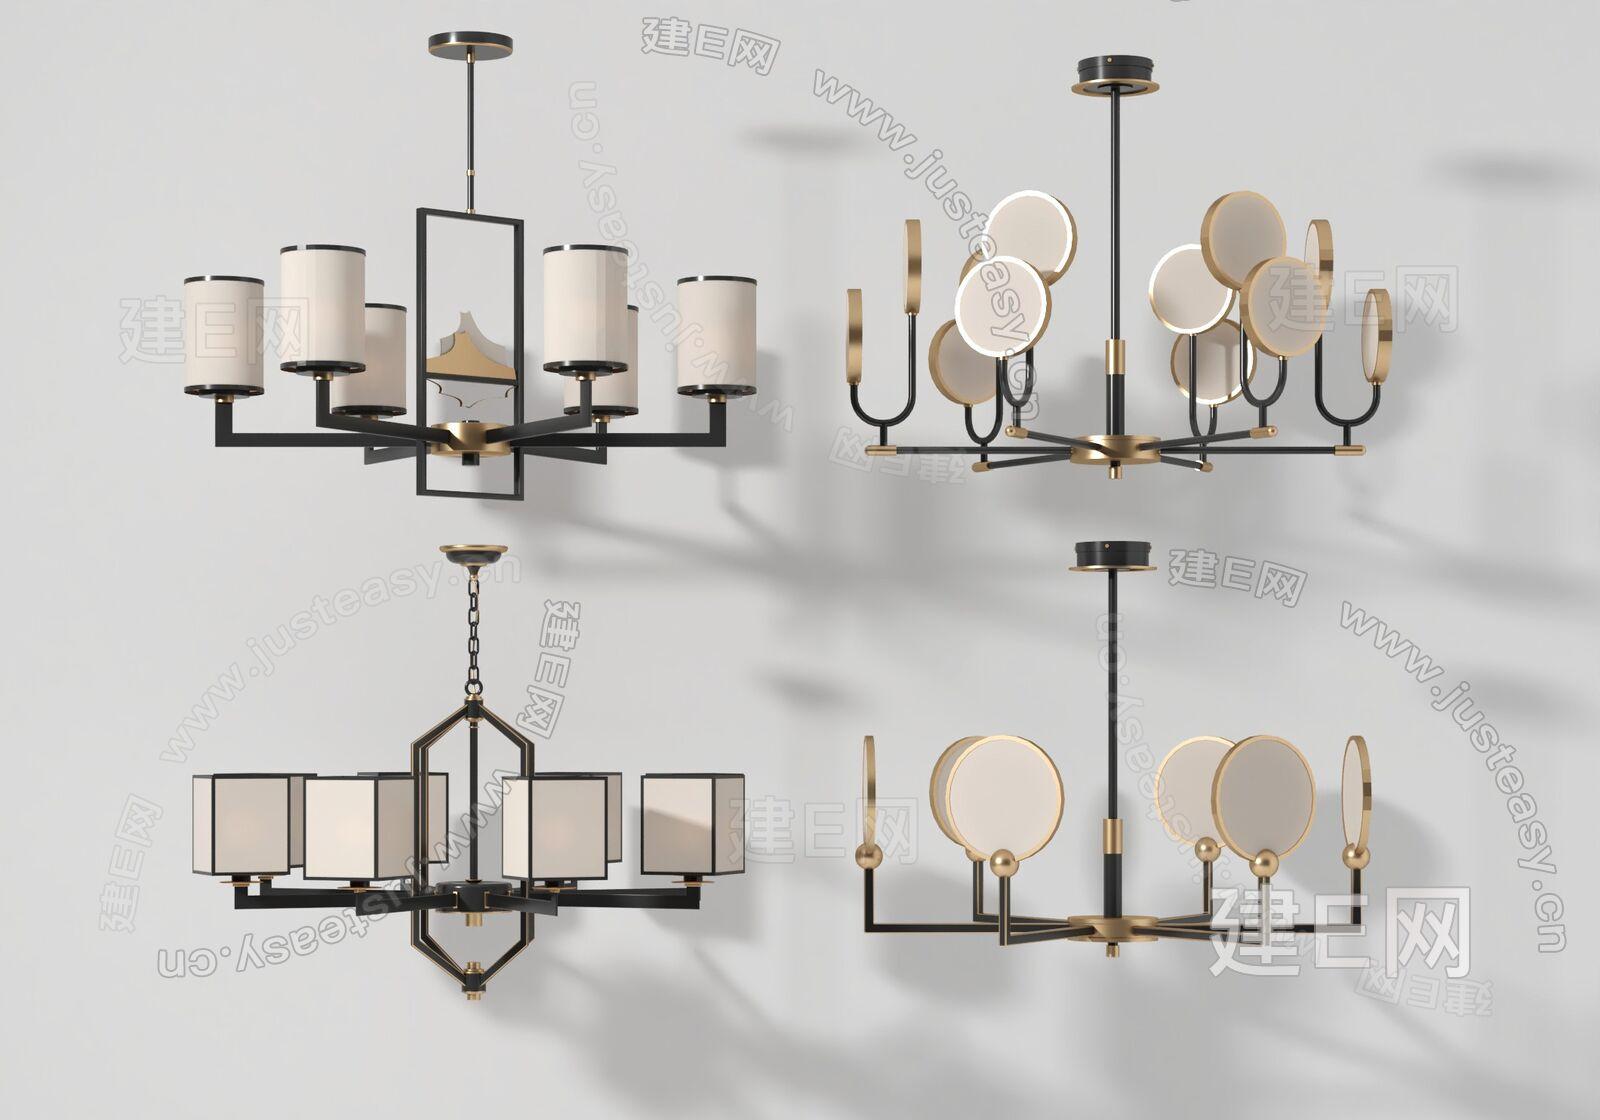 新中式吊灯组合sketchup模型